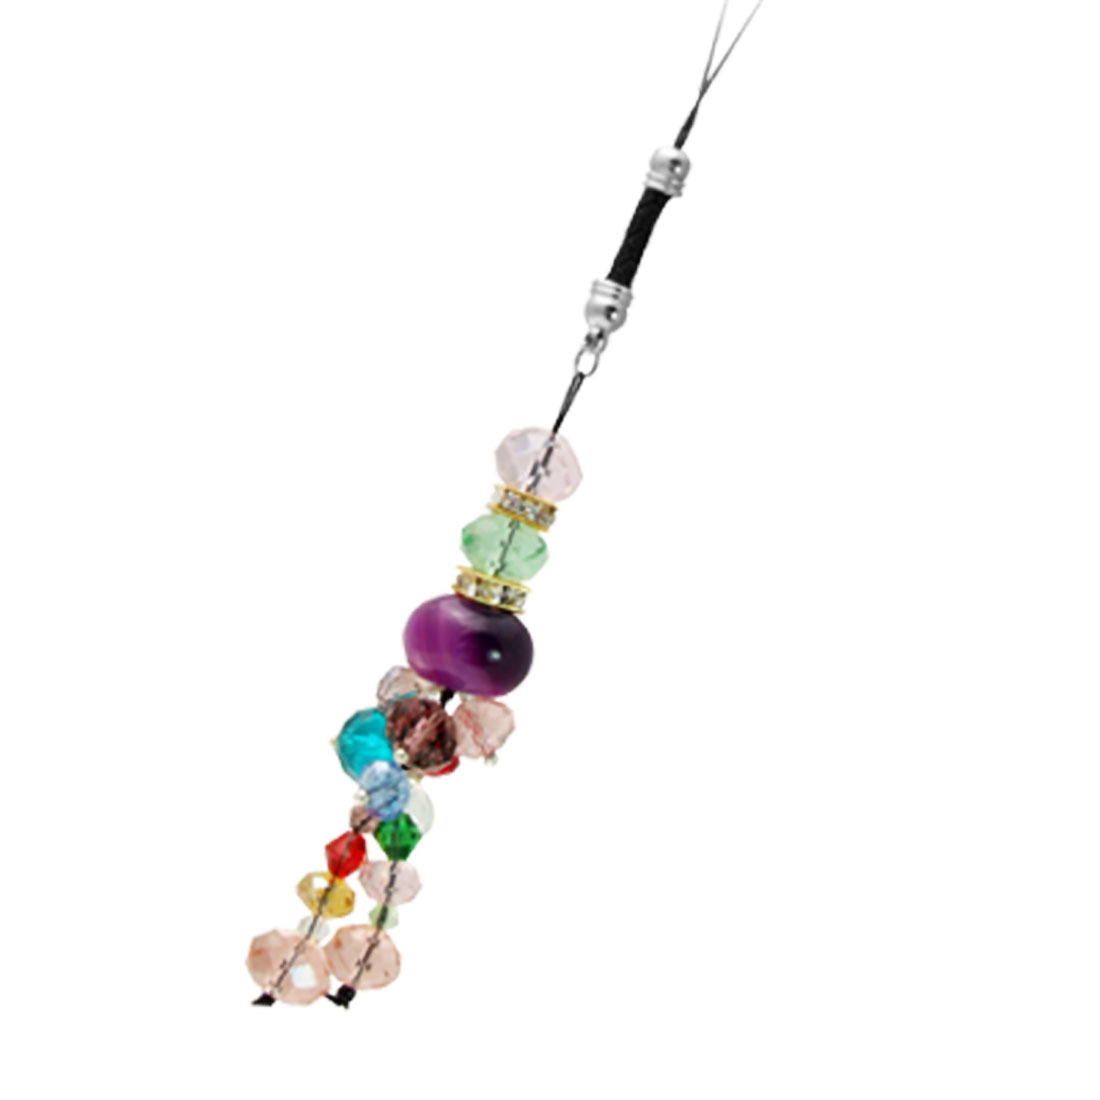 Attractive Crystal Strap Pendant for Mobile / Handbag